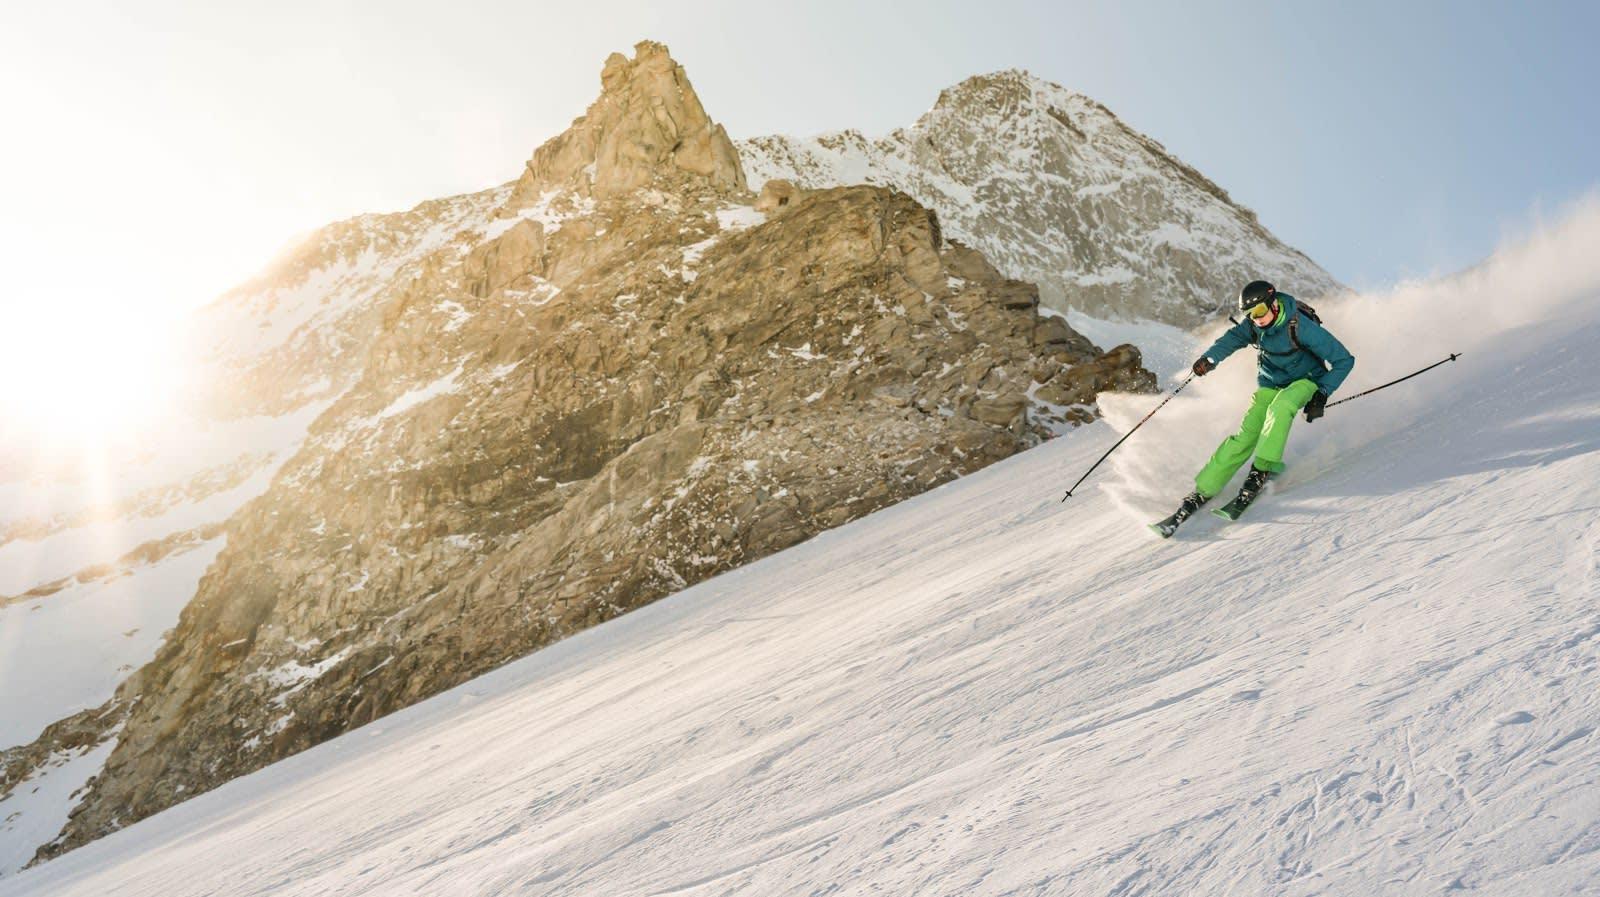 Aspen's Top Ski-In, Ski-Out Condo Communities